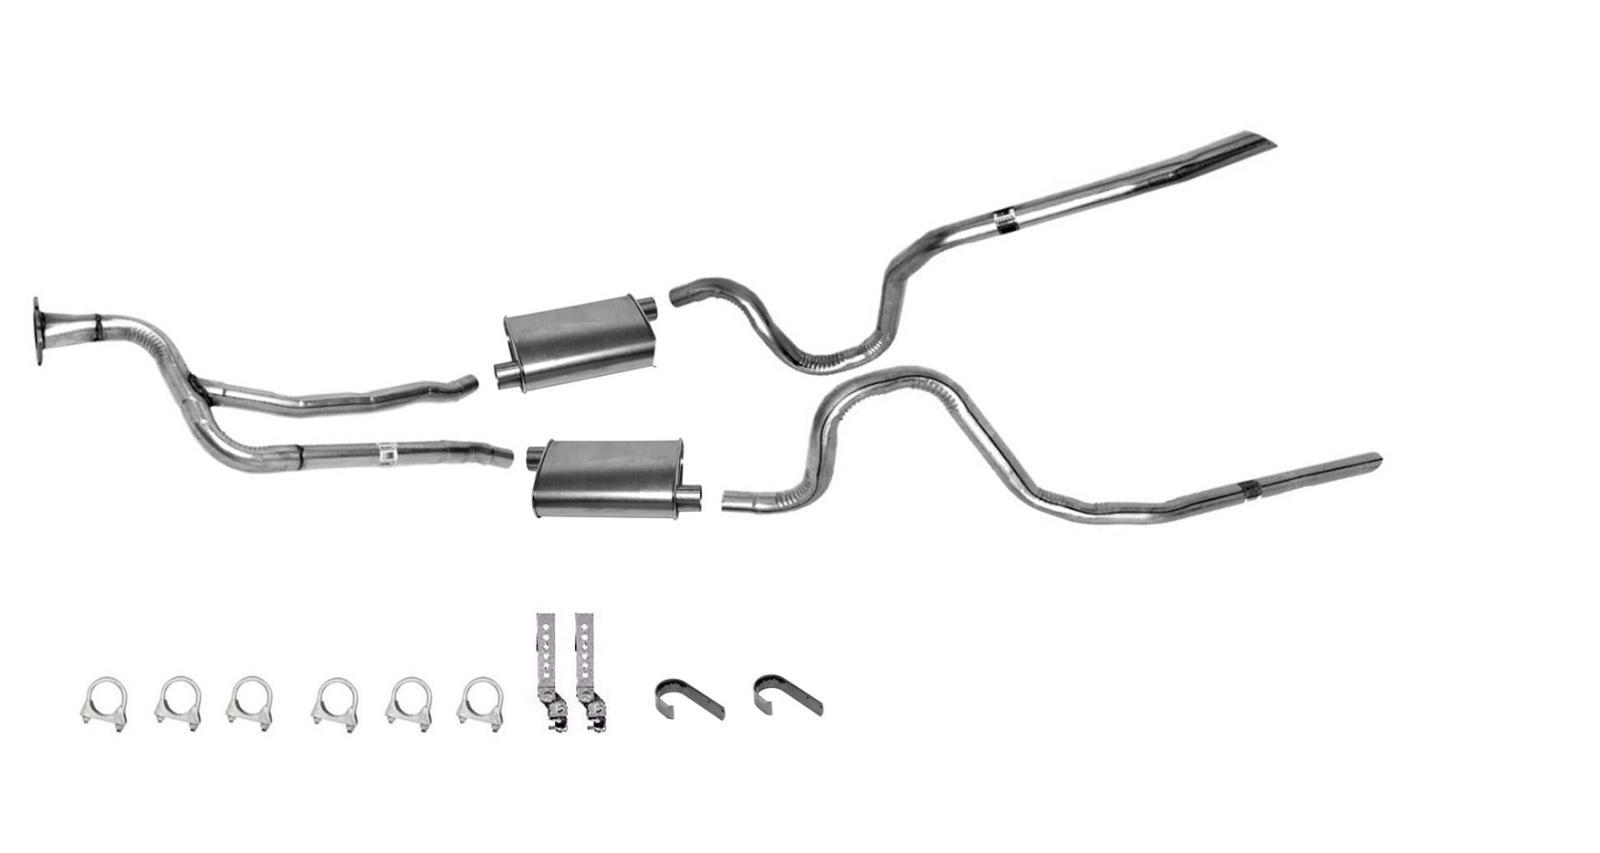 Monte Carlo Ss Dynomax Muffler Dual Exhaust Pipe